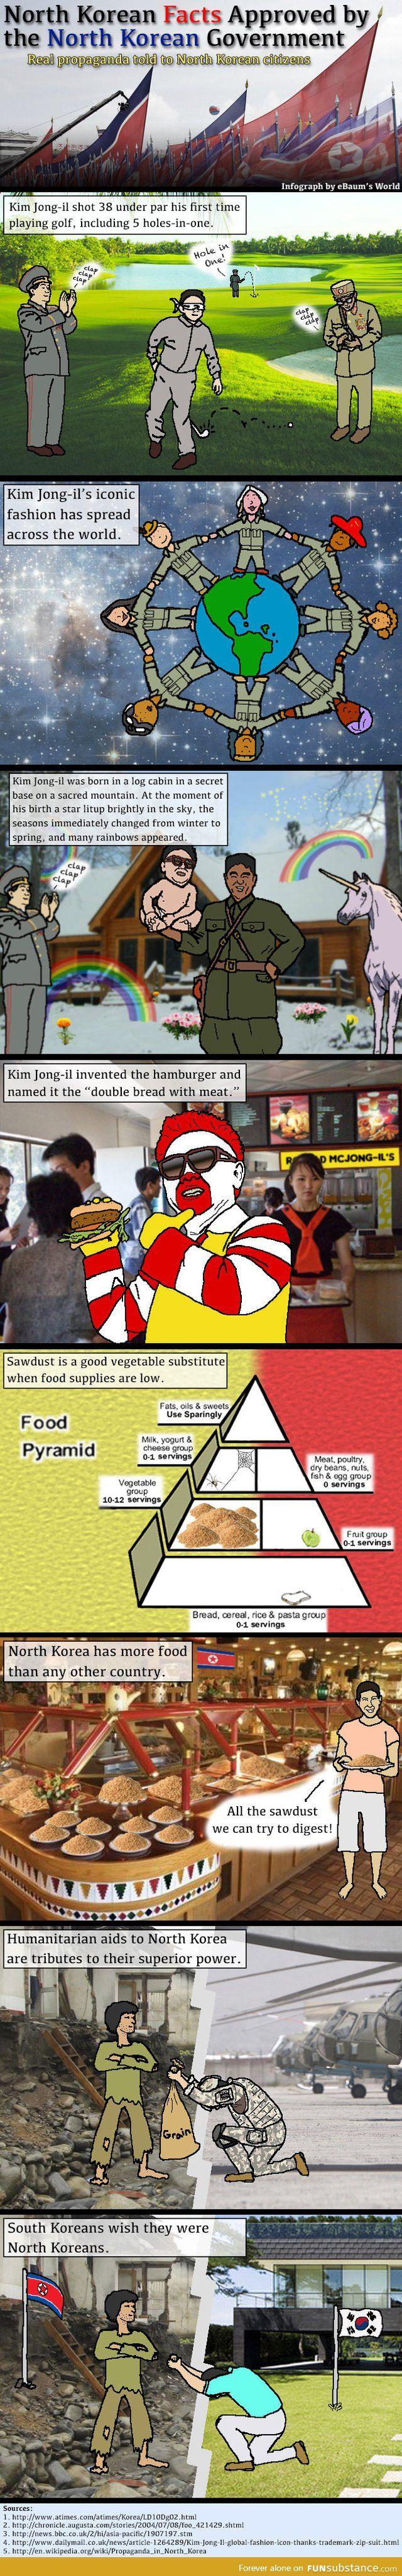 North Korea fun facts